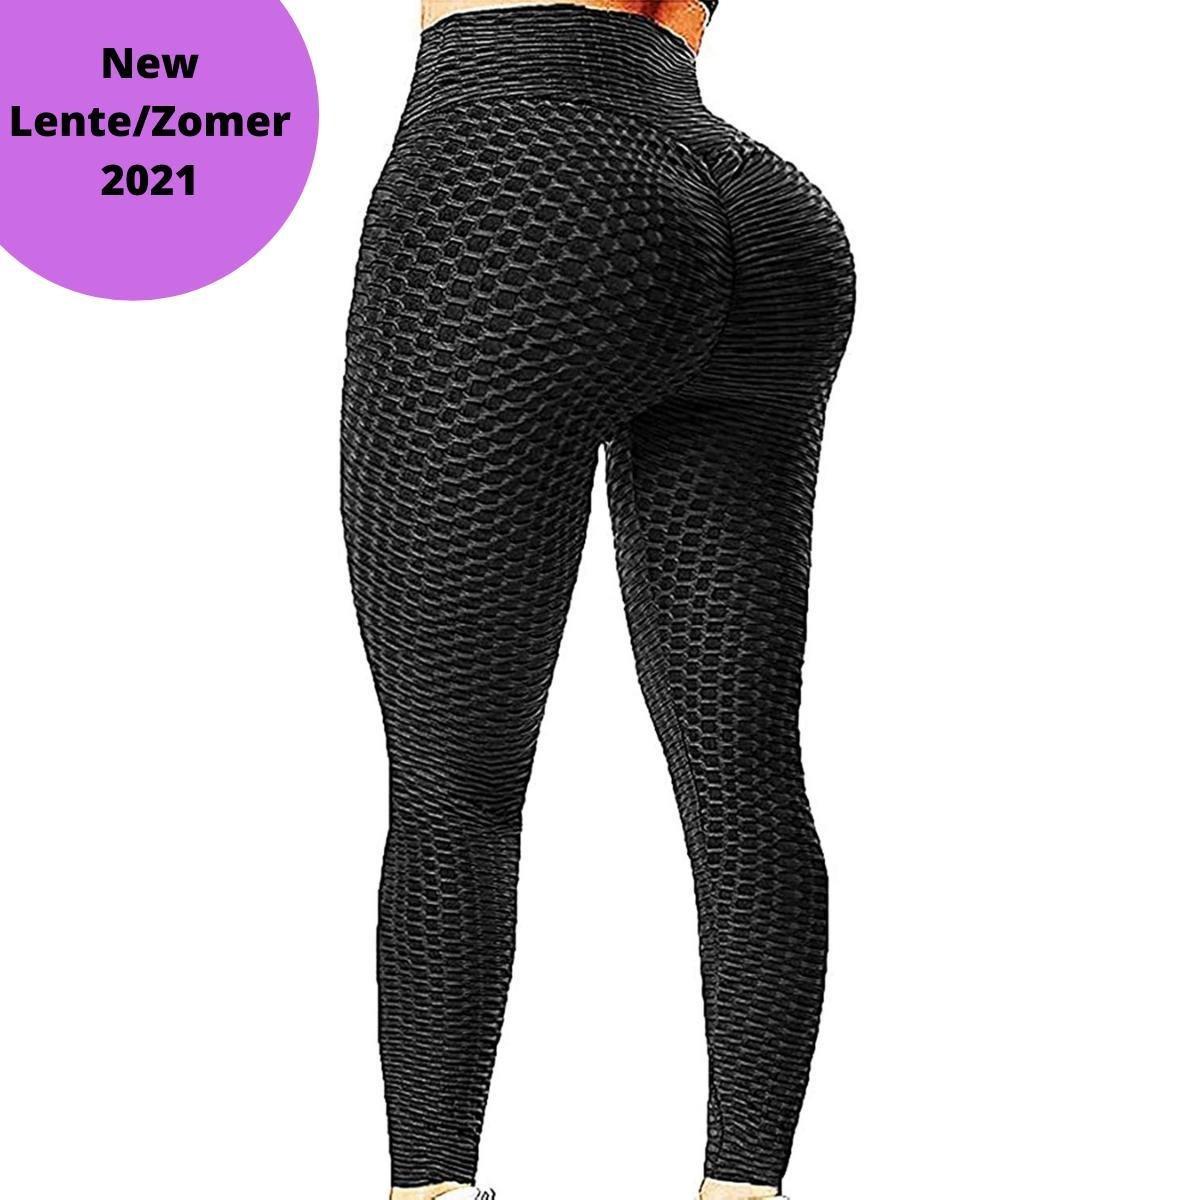 Bodyboil TikTok Legging 2021 - Honingraat Patroon - Anti Cellulite - Sportlegging Dames - Squat Proo